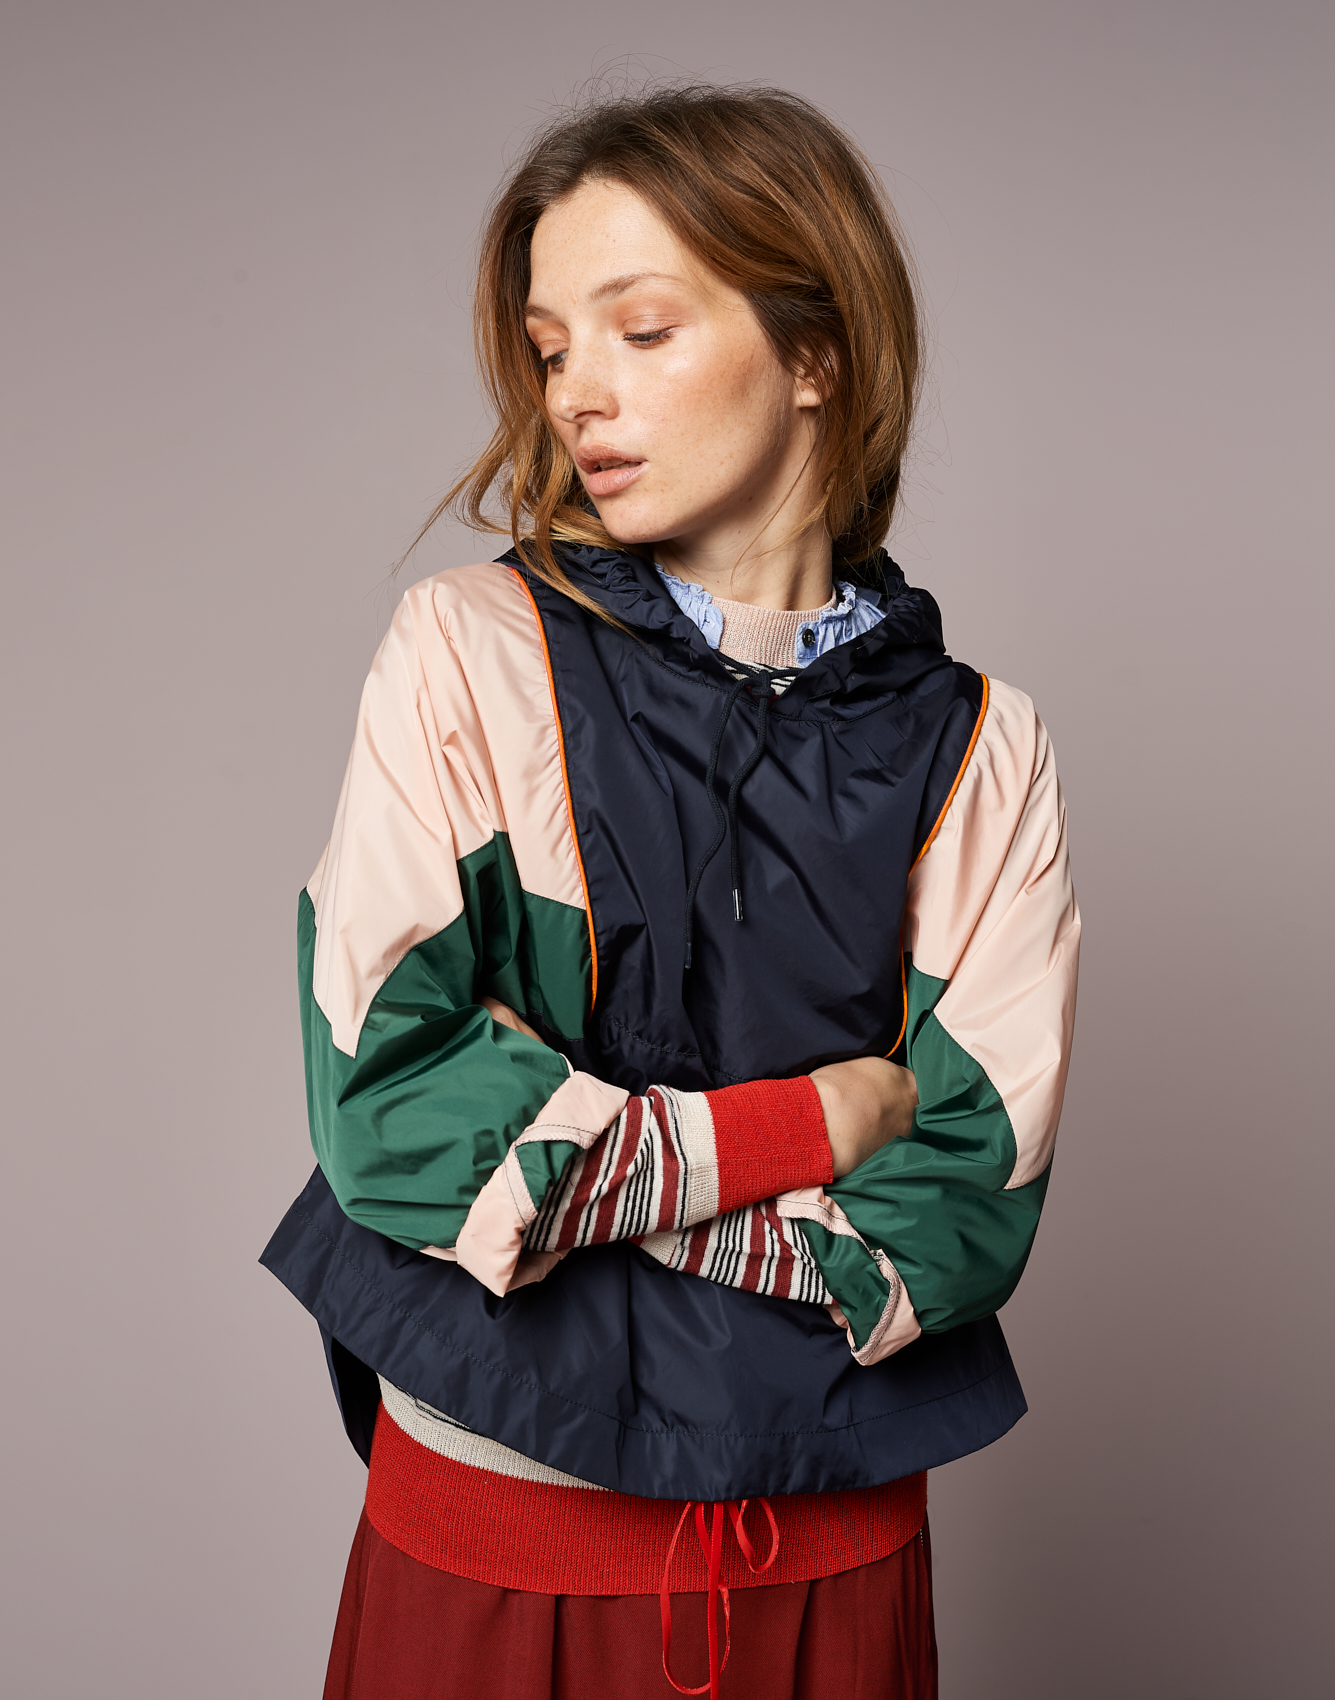 Rain Jacket Horizon  -  Knitwear Senia  -  Shirt Safran